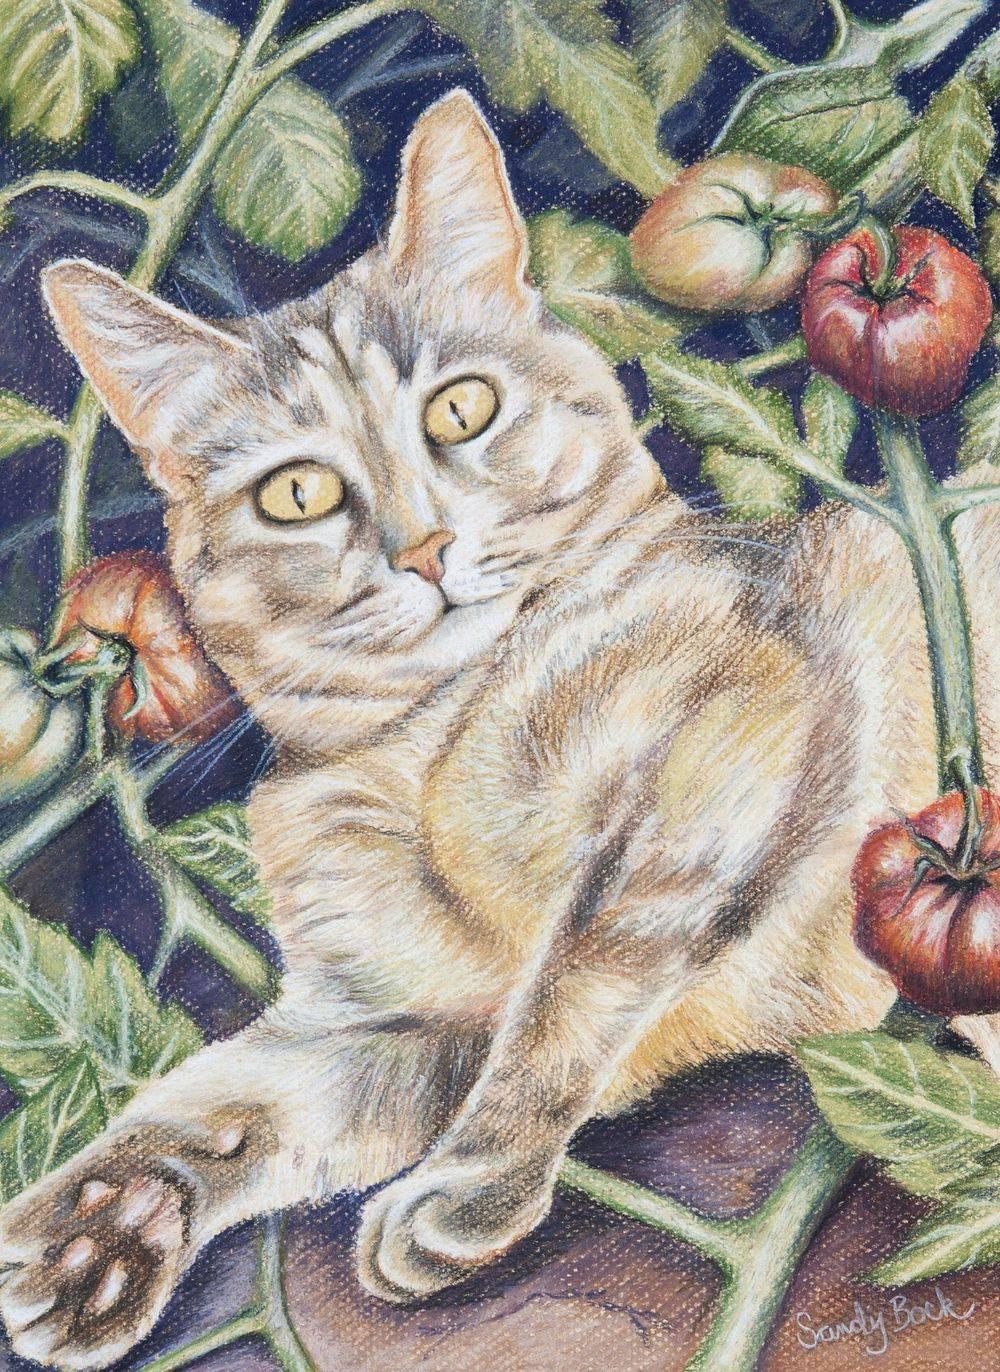 sandy bock, cat, cat illustration, garden art, pastel art, tomato garden, tomatoes, portrait illustration